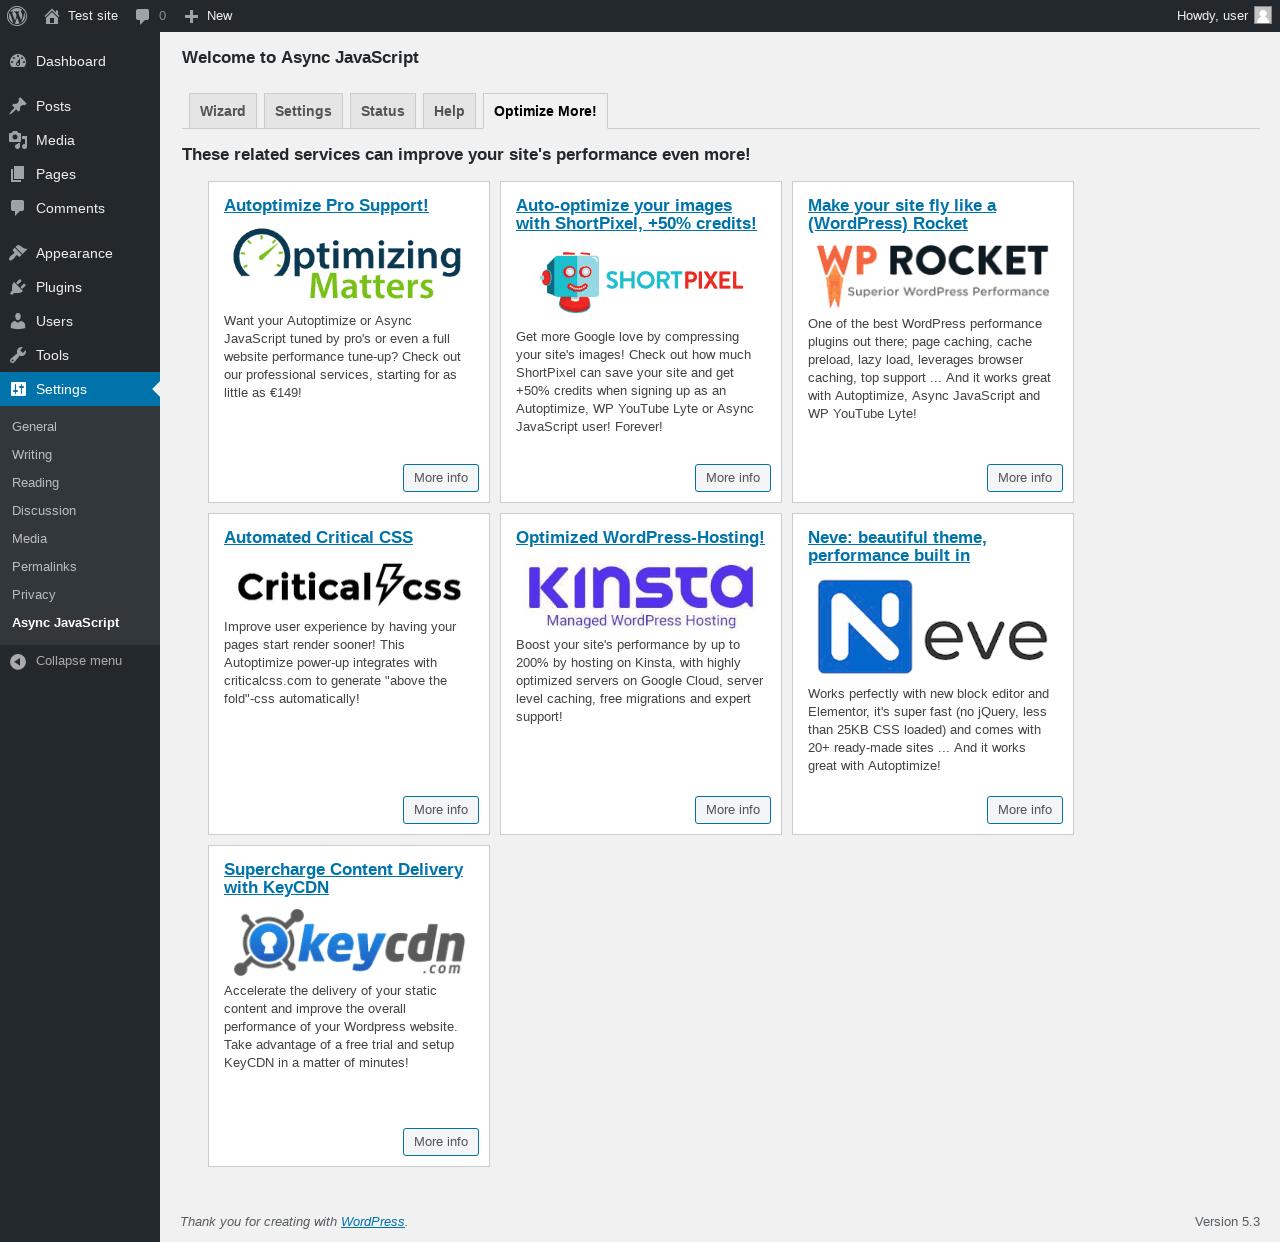 Report - Async JavaScript 2 19 07 14 - PluginTests com